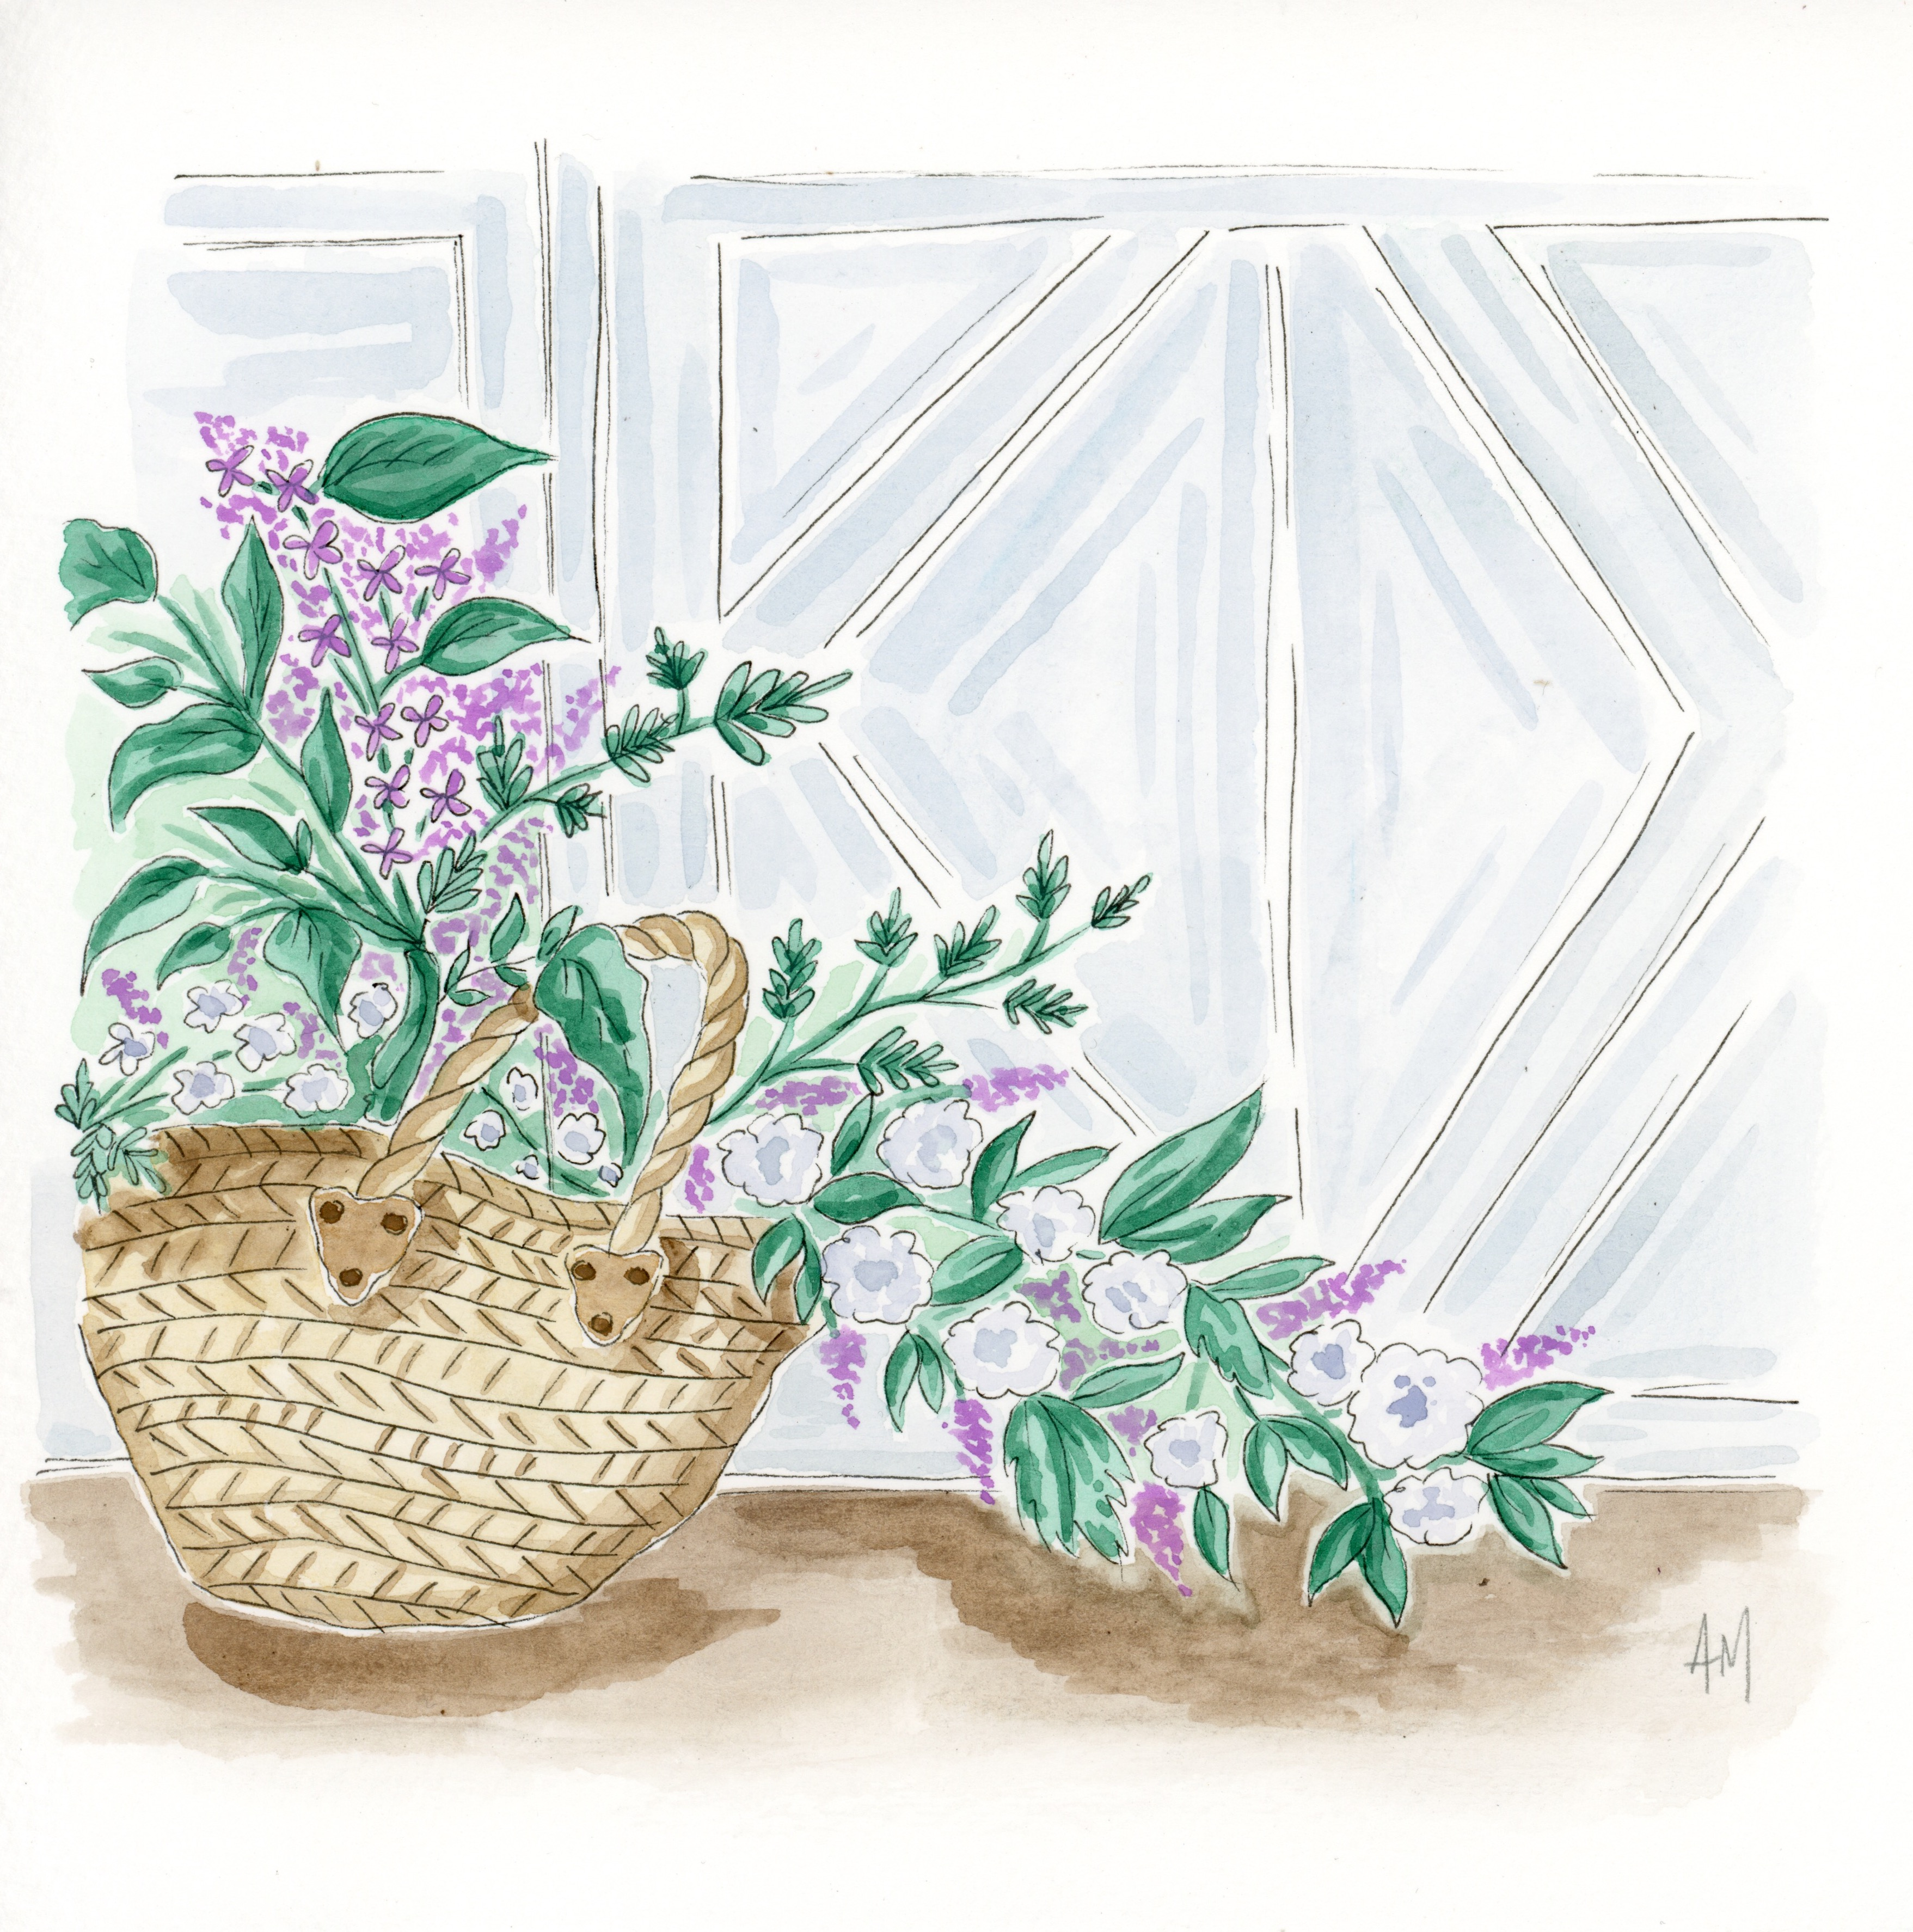 Barnyard Flowers Illustration